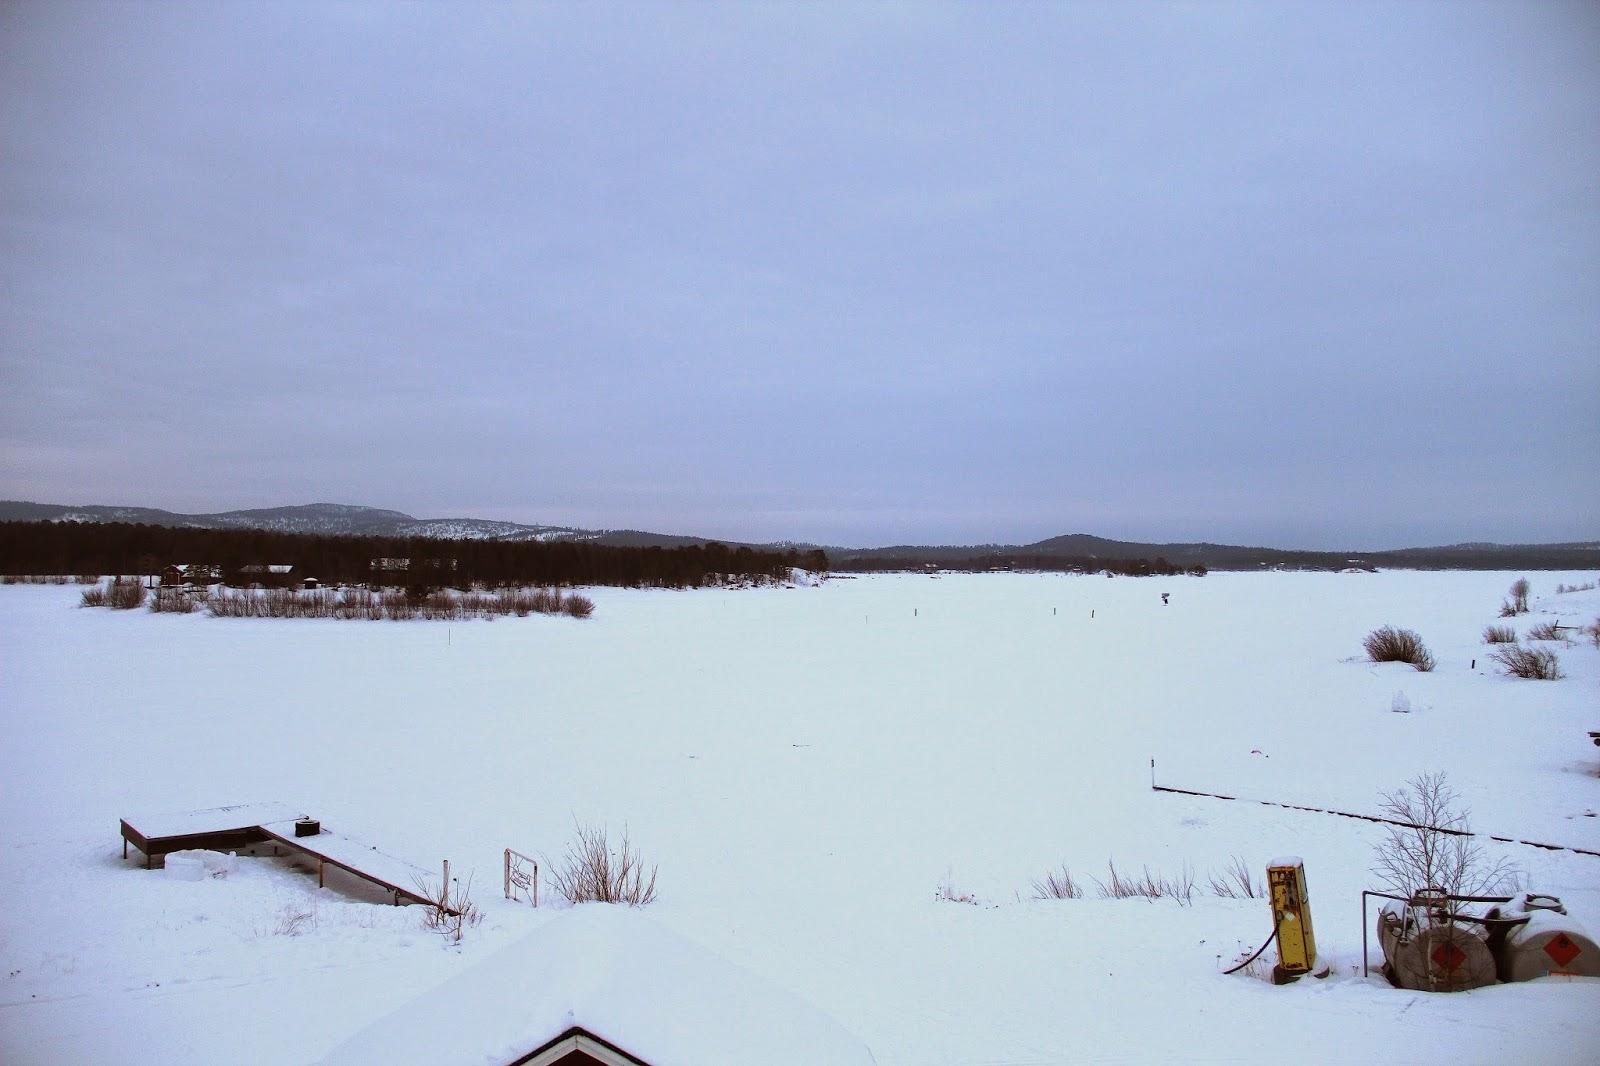 Lake Inari, Finland